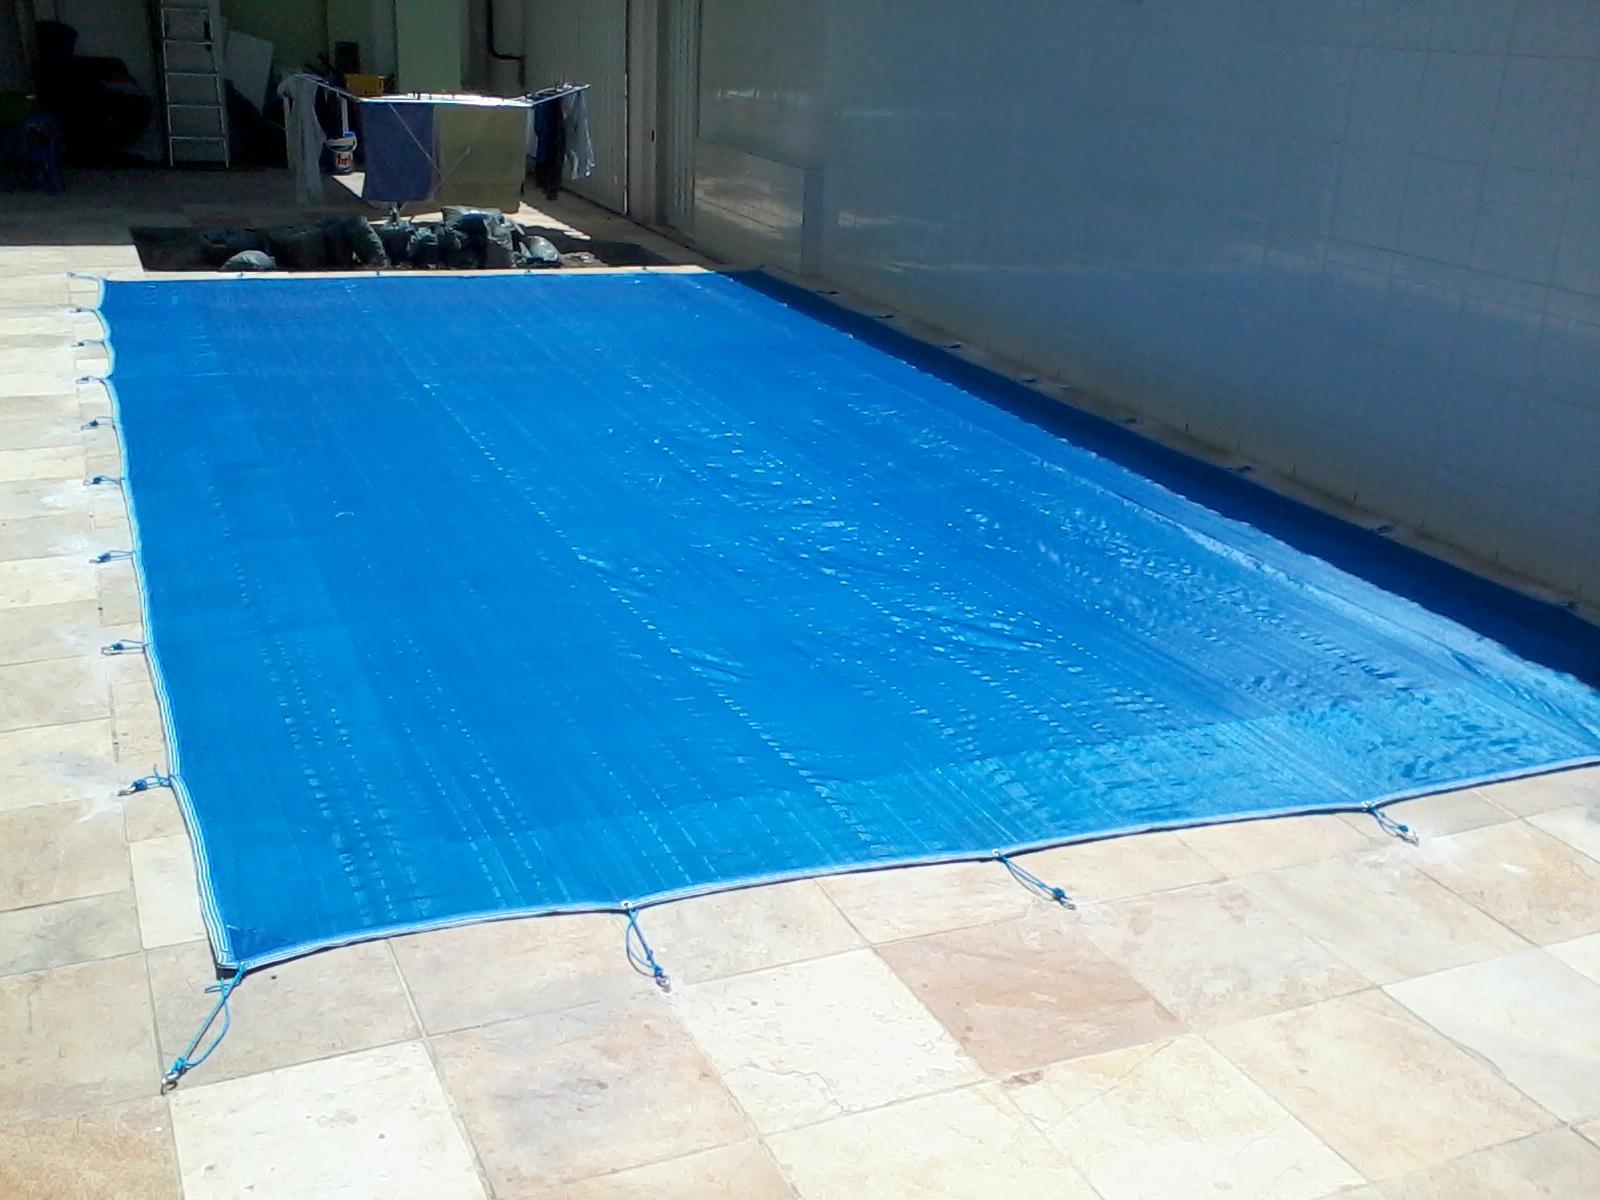 Capas para piscinas no rj capa de piscina - Material de piscina ...